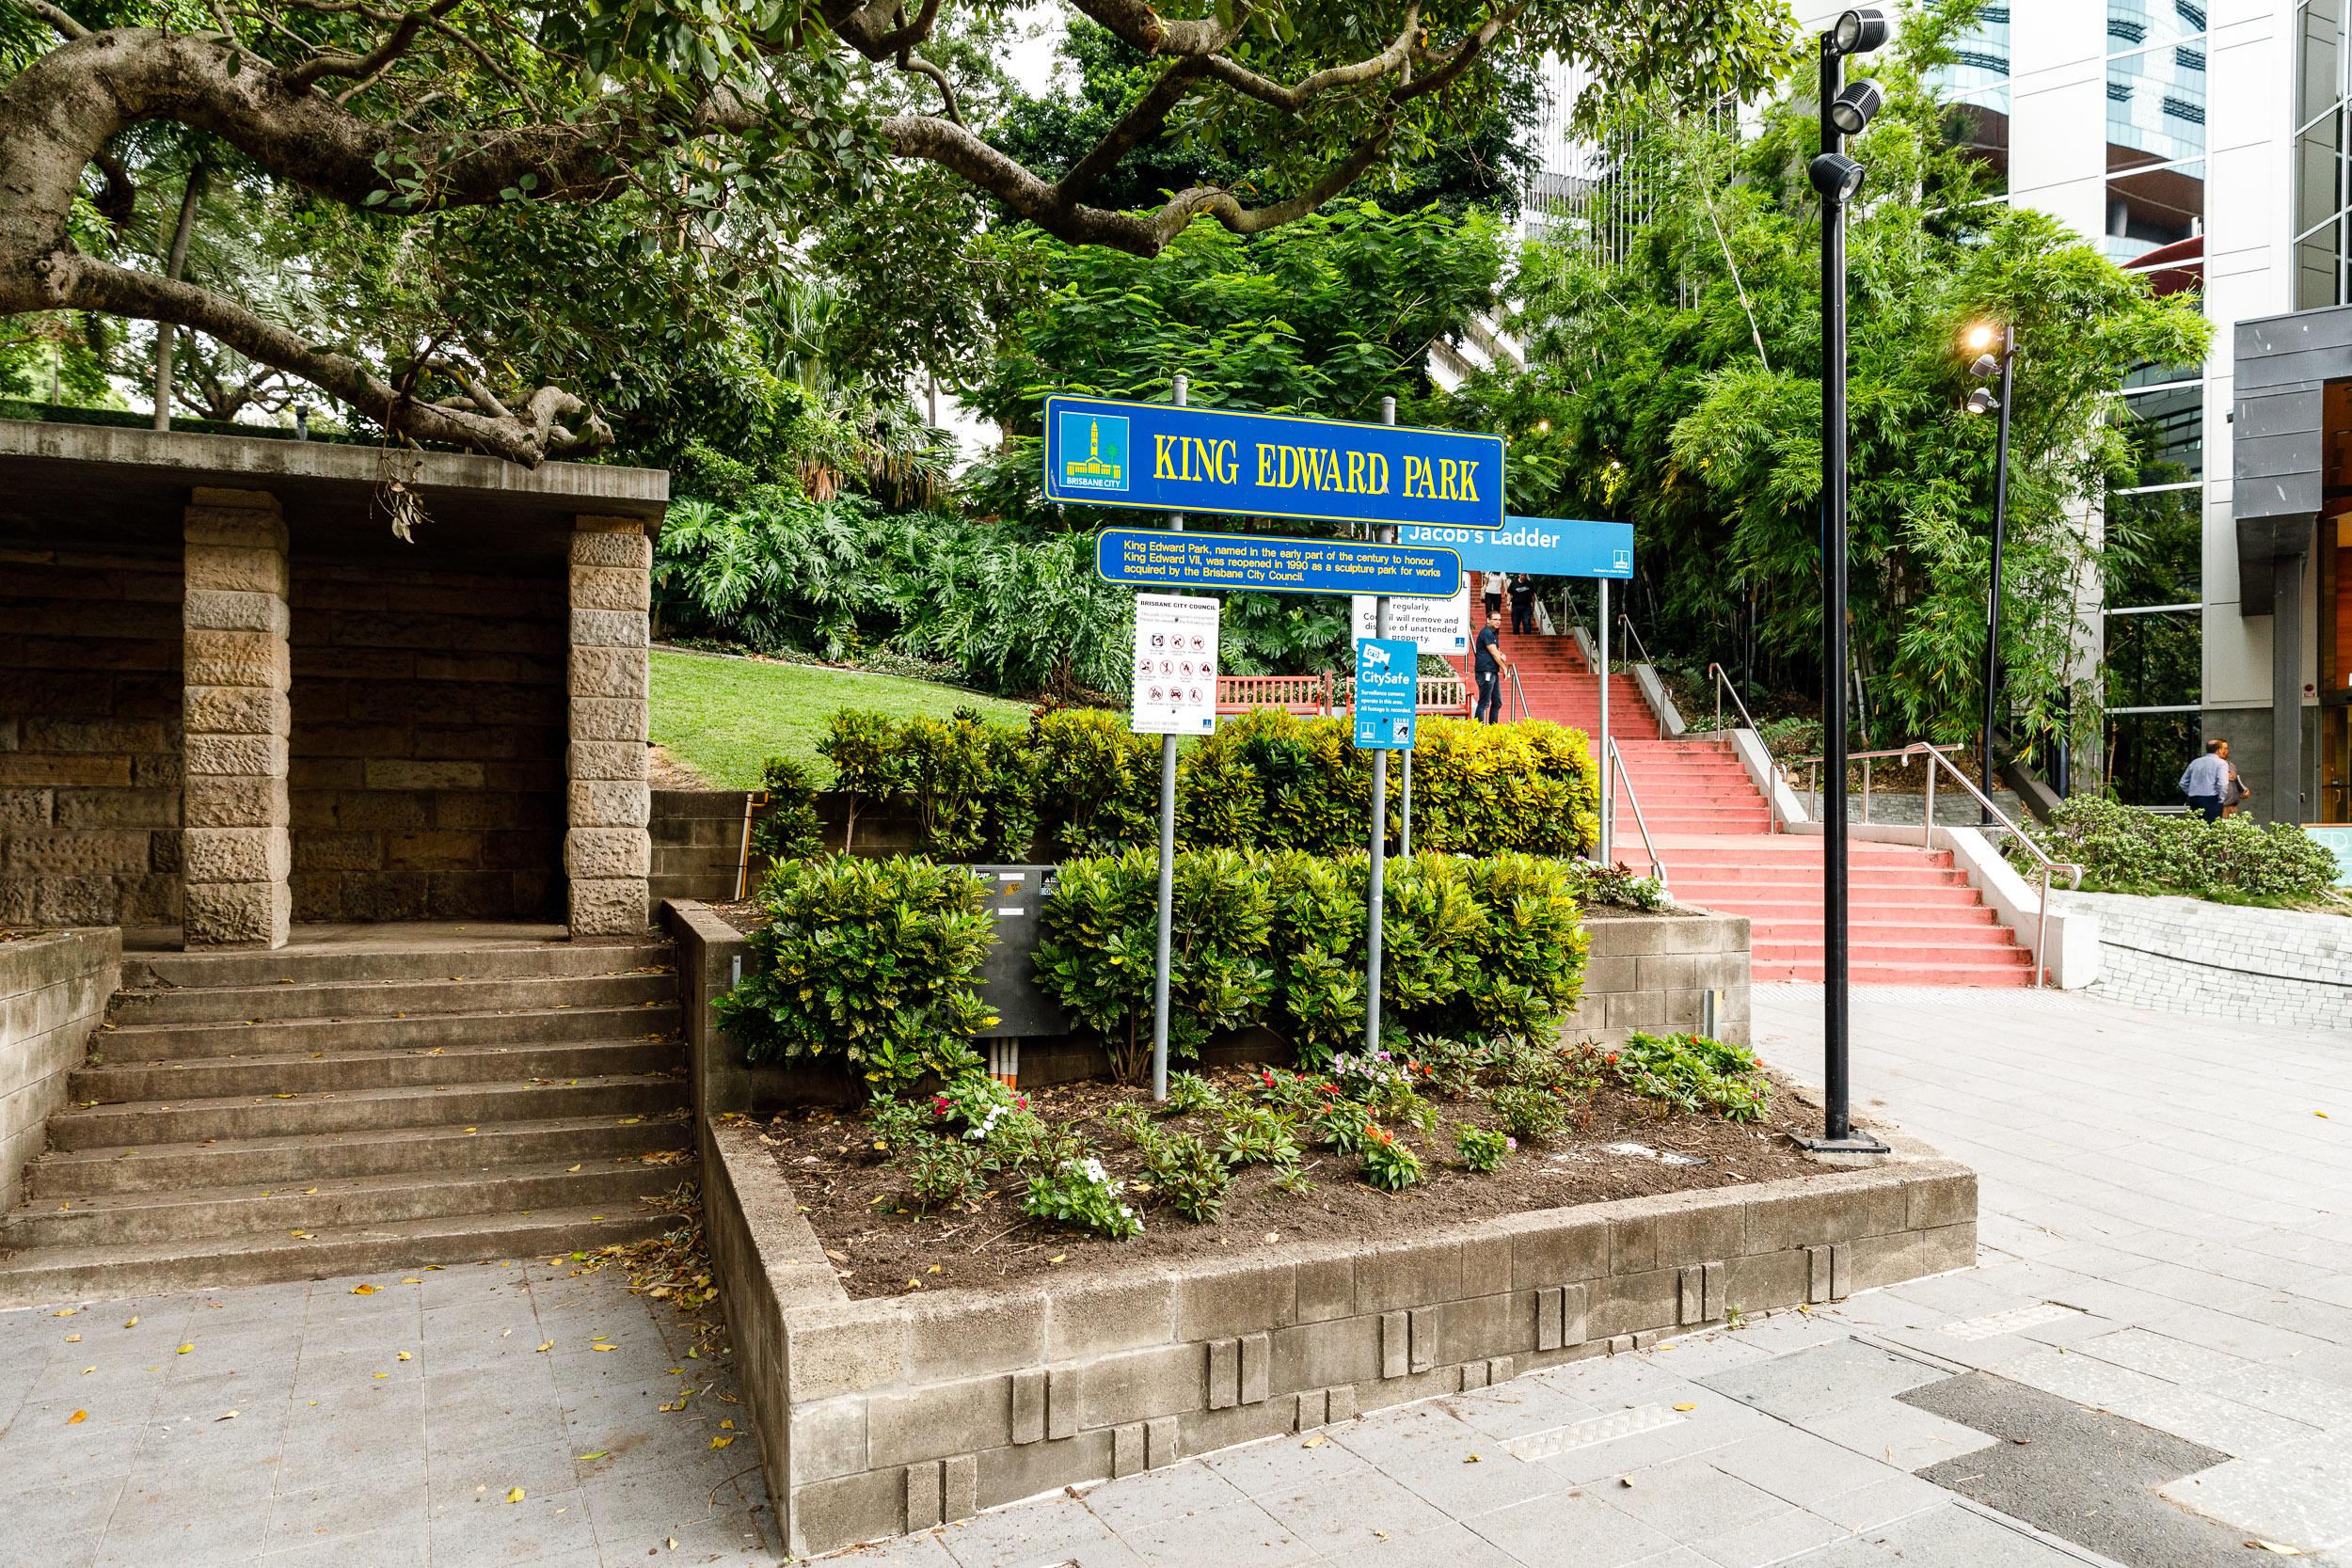 King Edward Park Entrance (200m from 180 Brisbane)